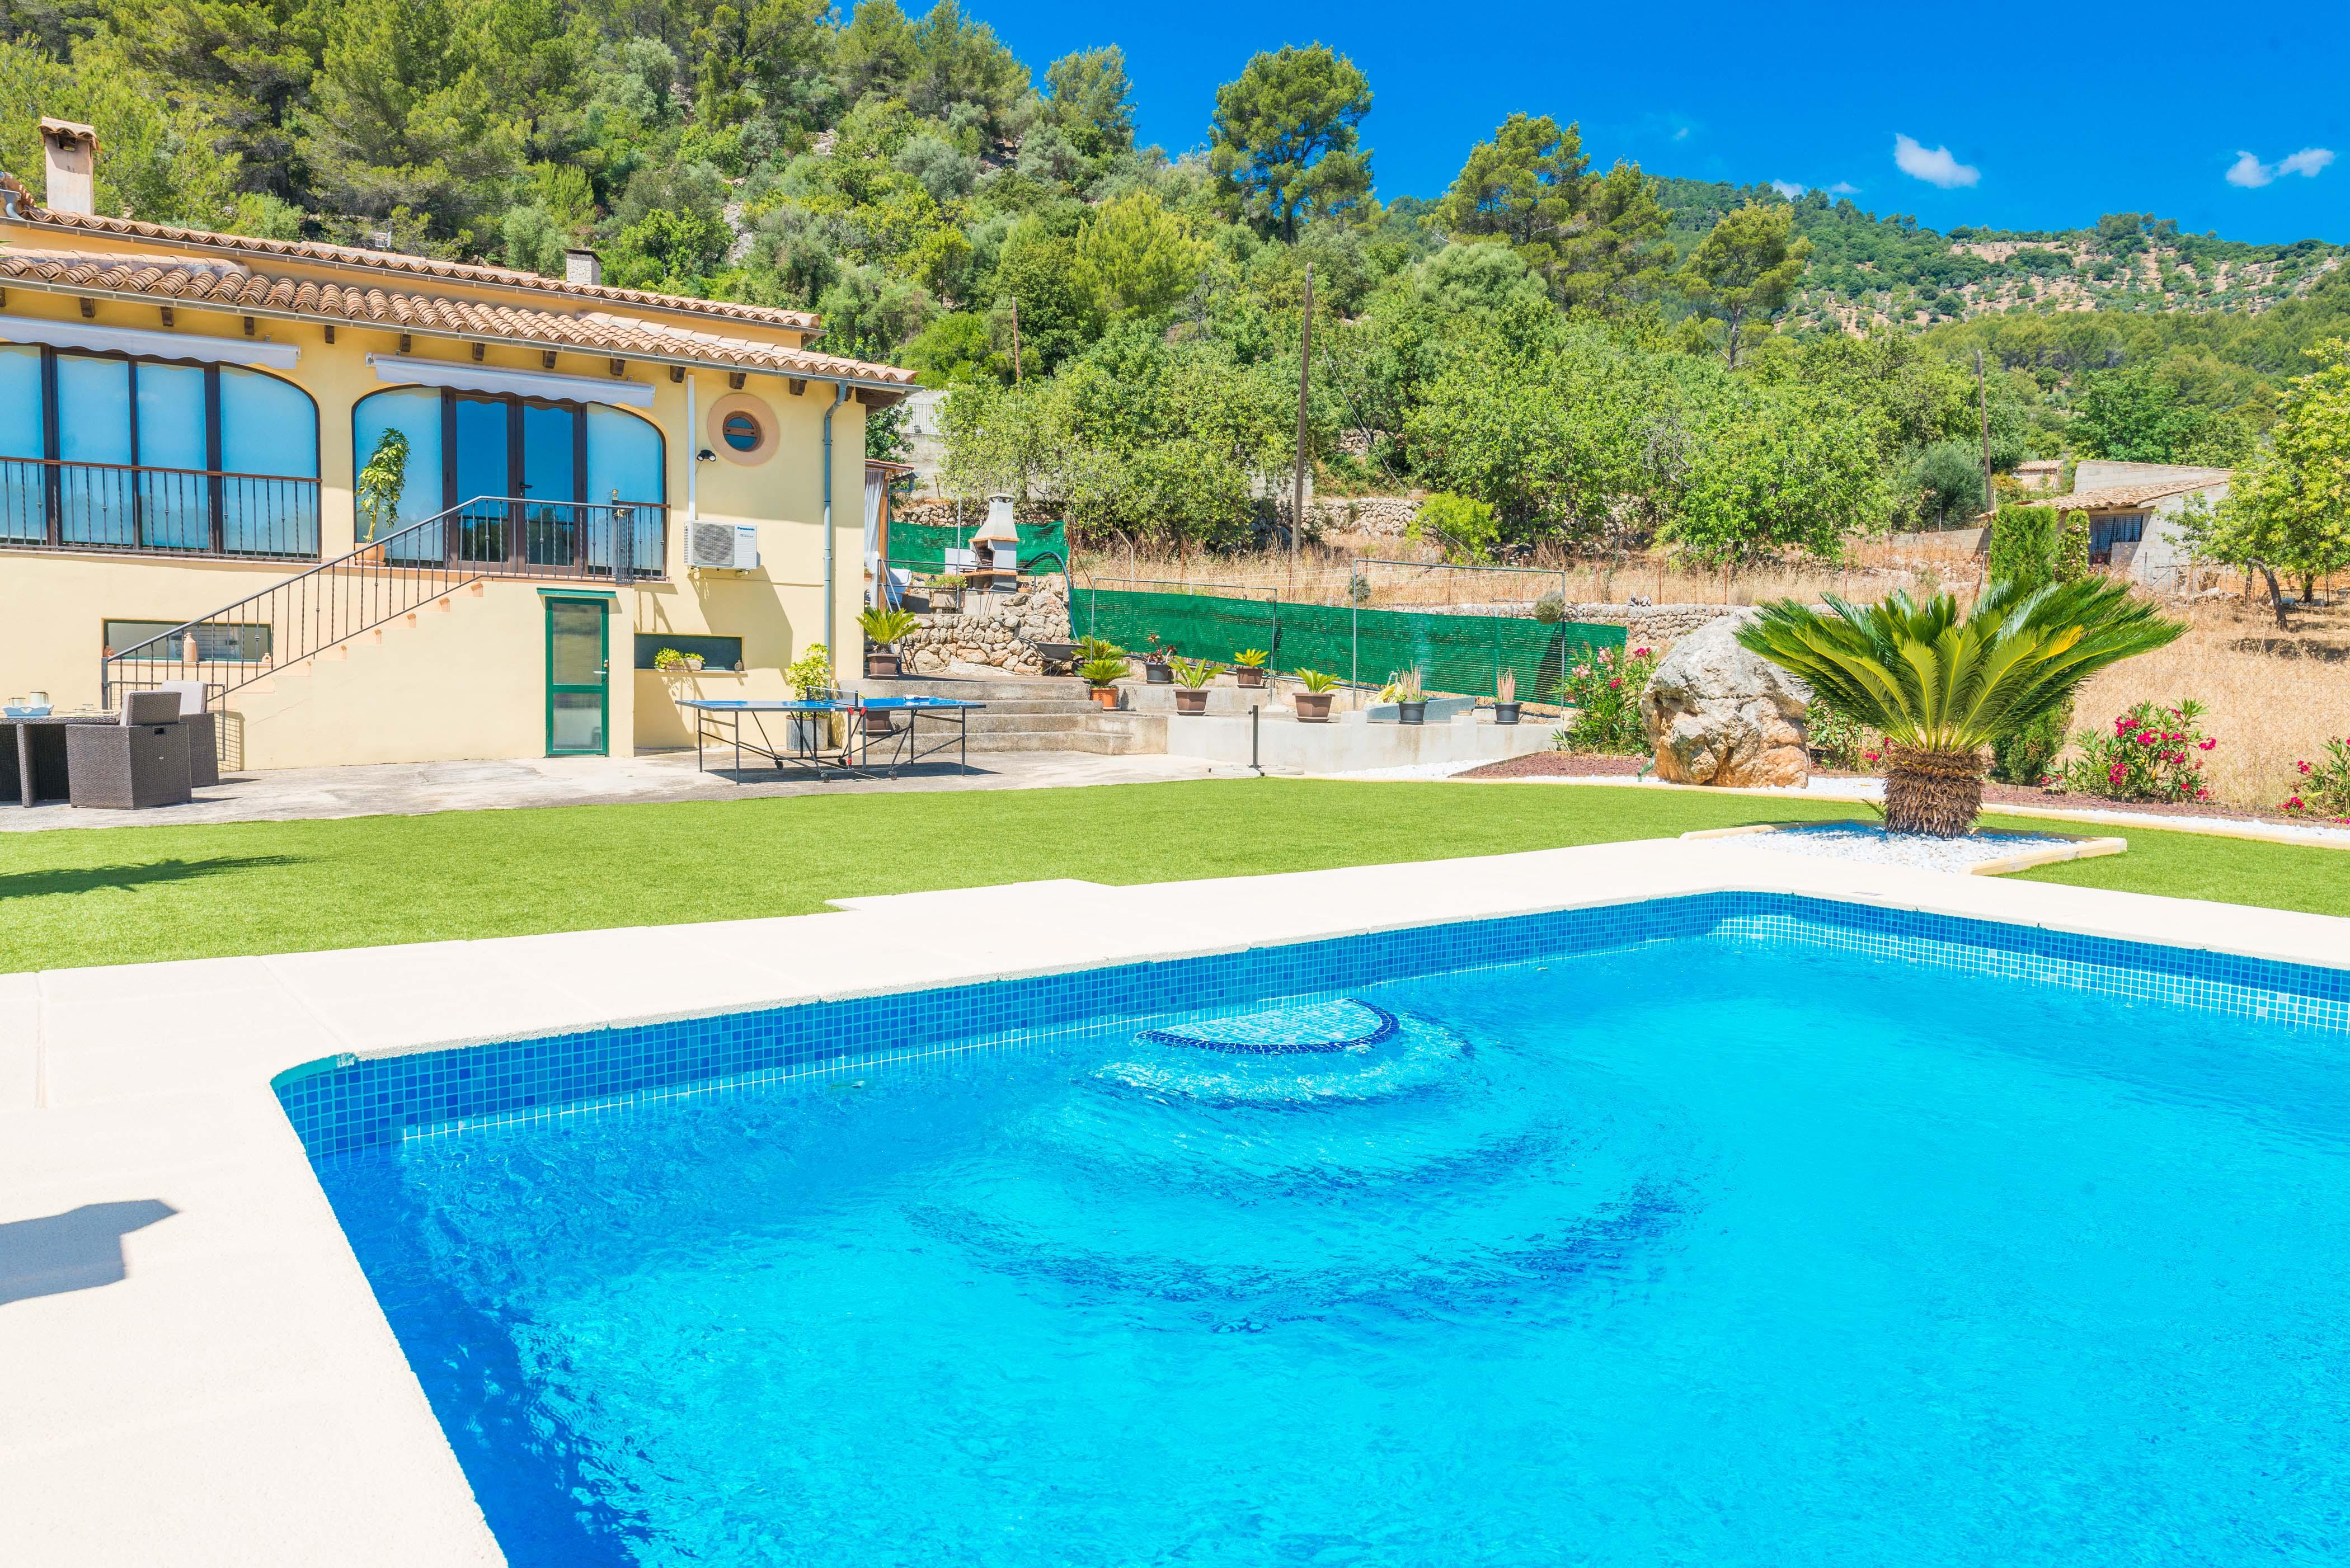 Ferienhaus SA TANCA (MANCORINA) (2037553), Mancor de la Vall, Mallorca, Balearische Inseln, Spanien, Bild 28